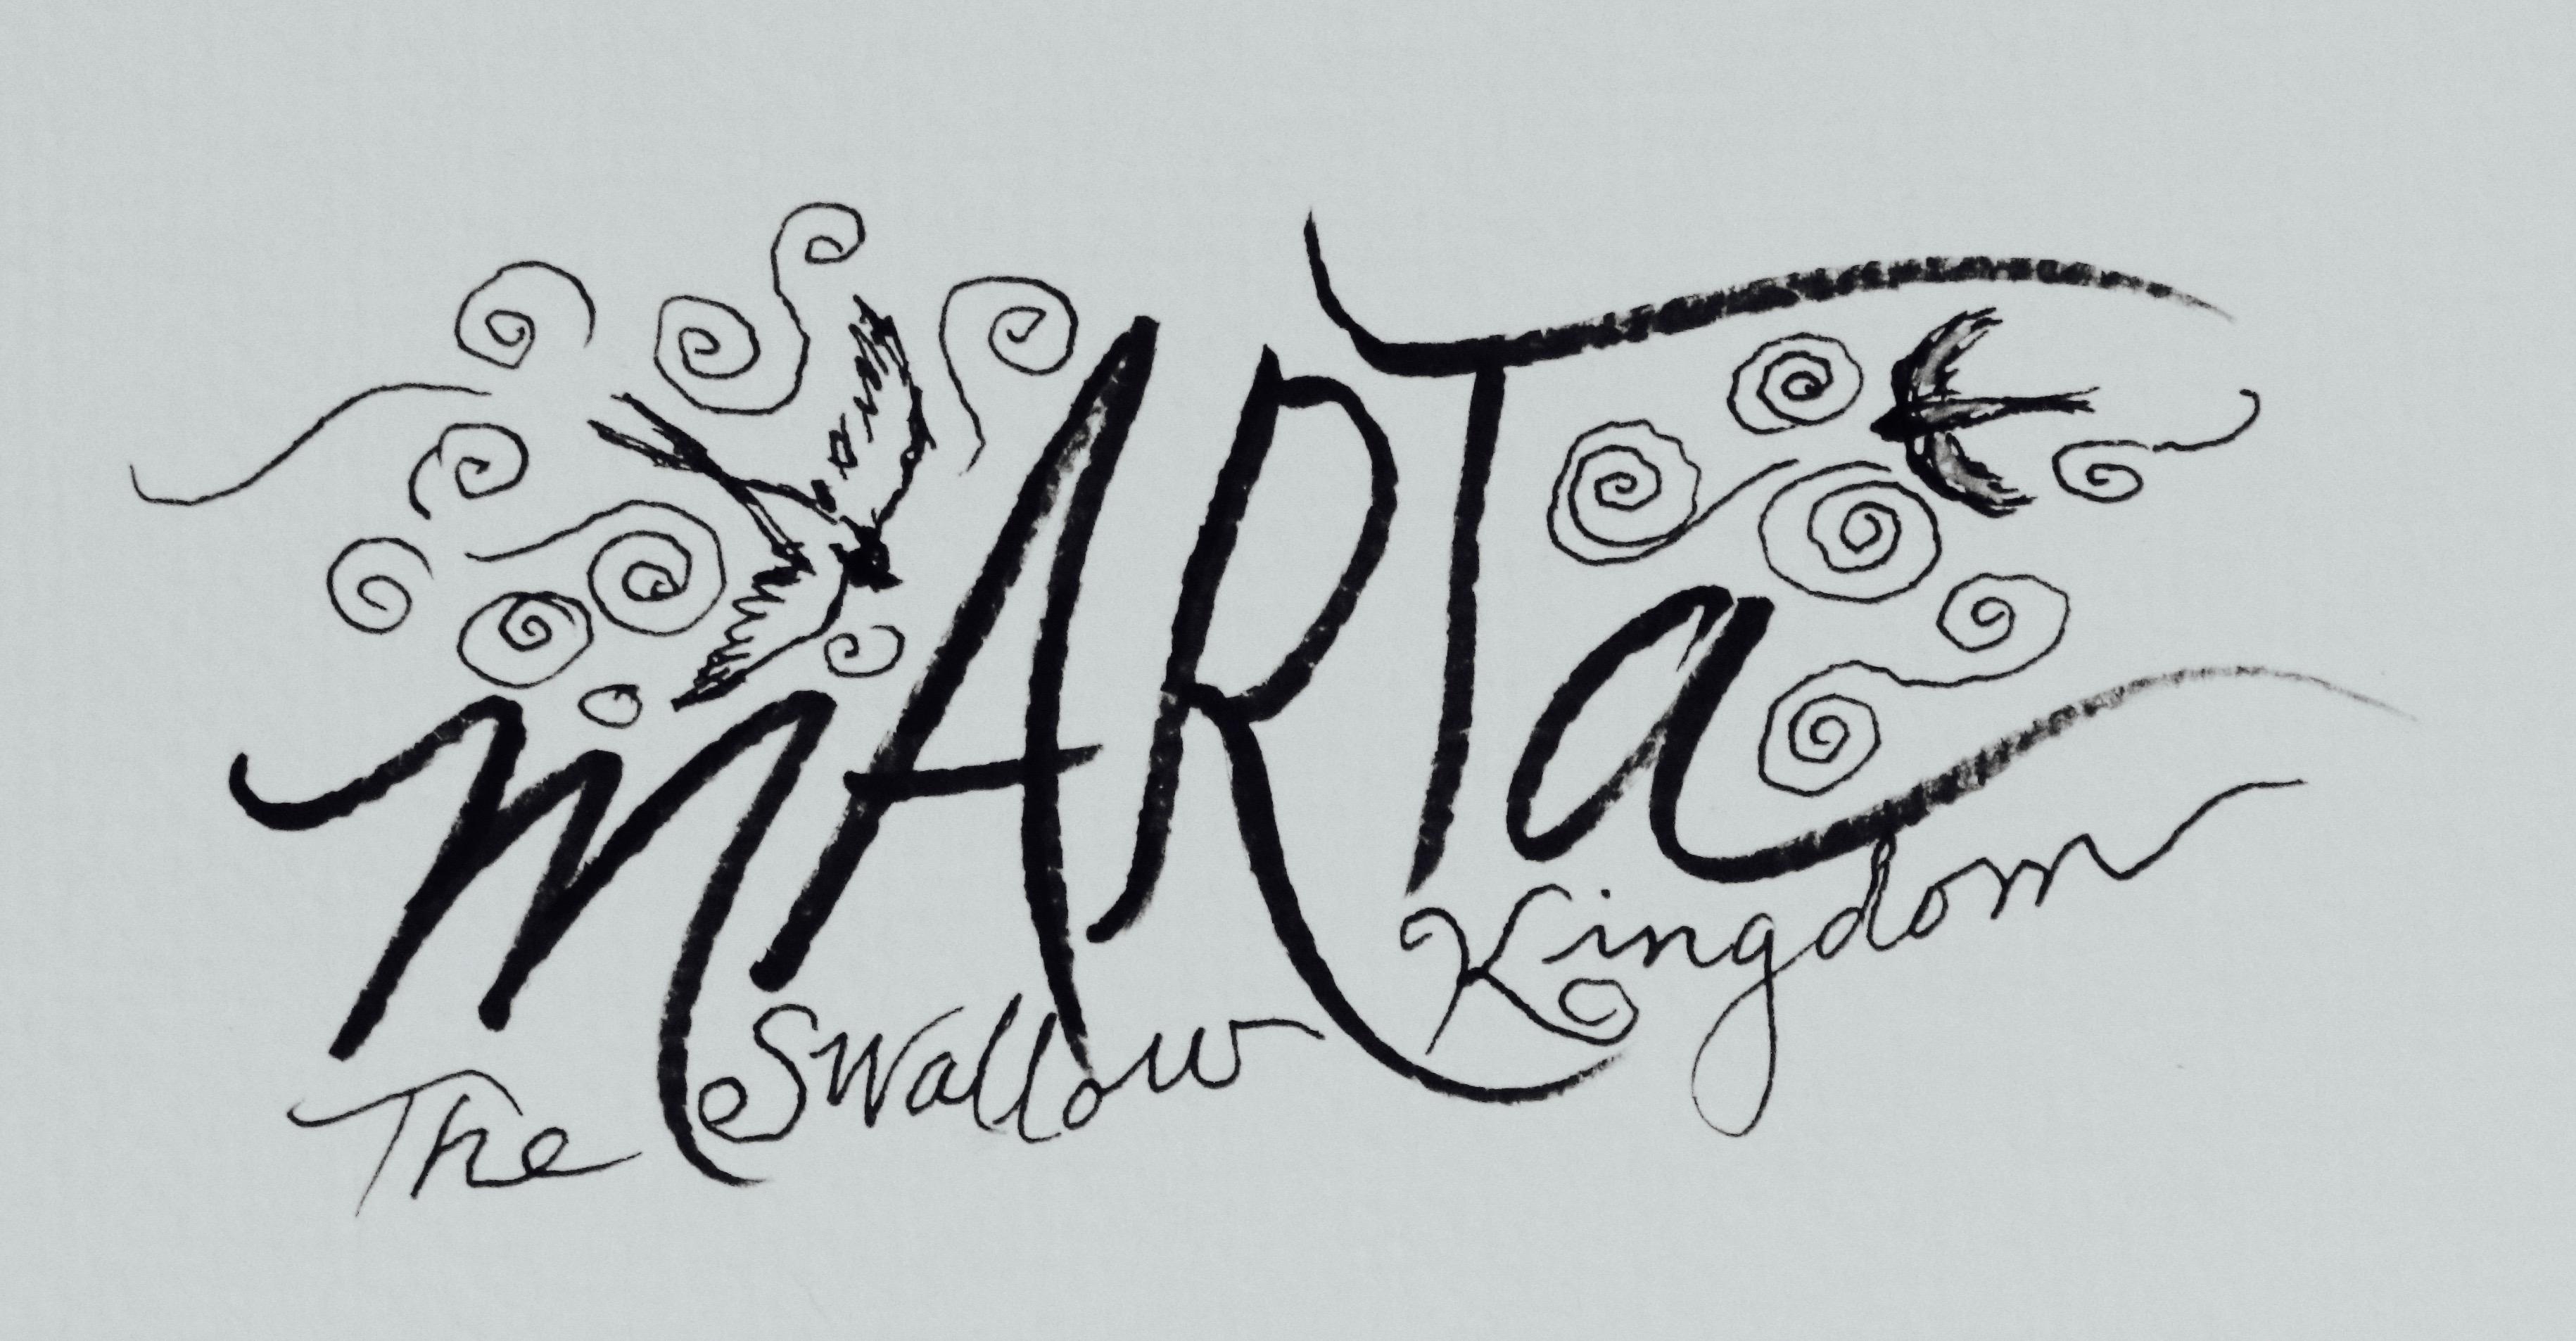 marta olson's Signature